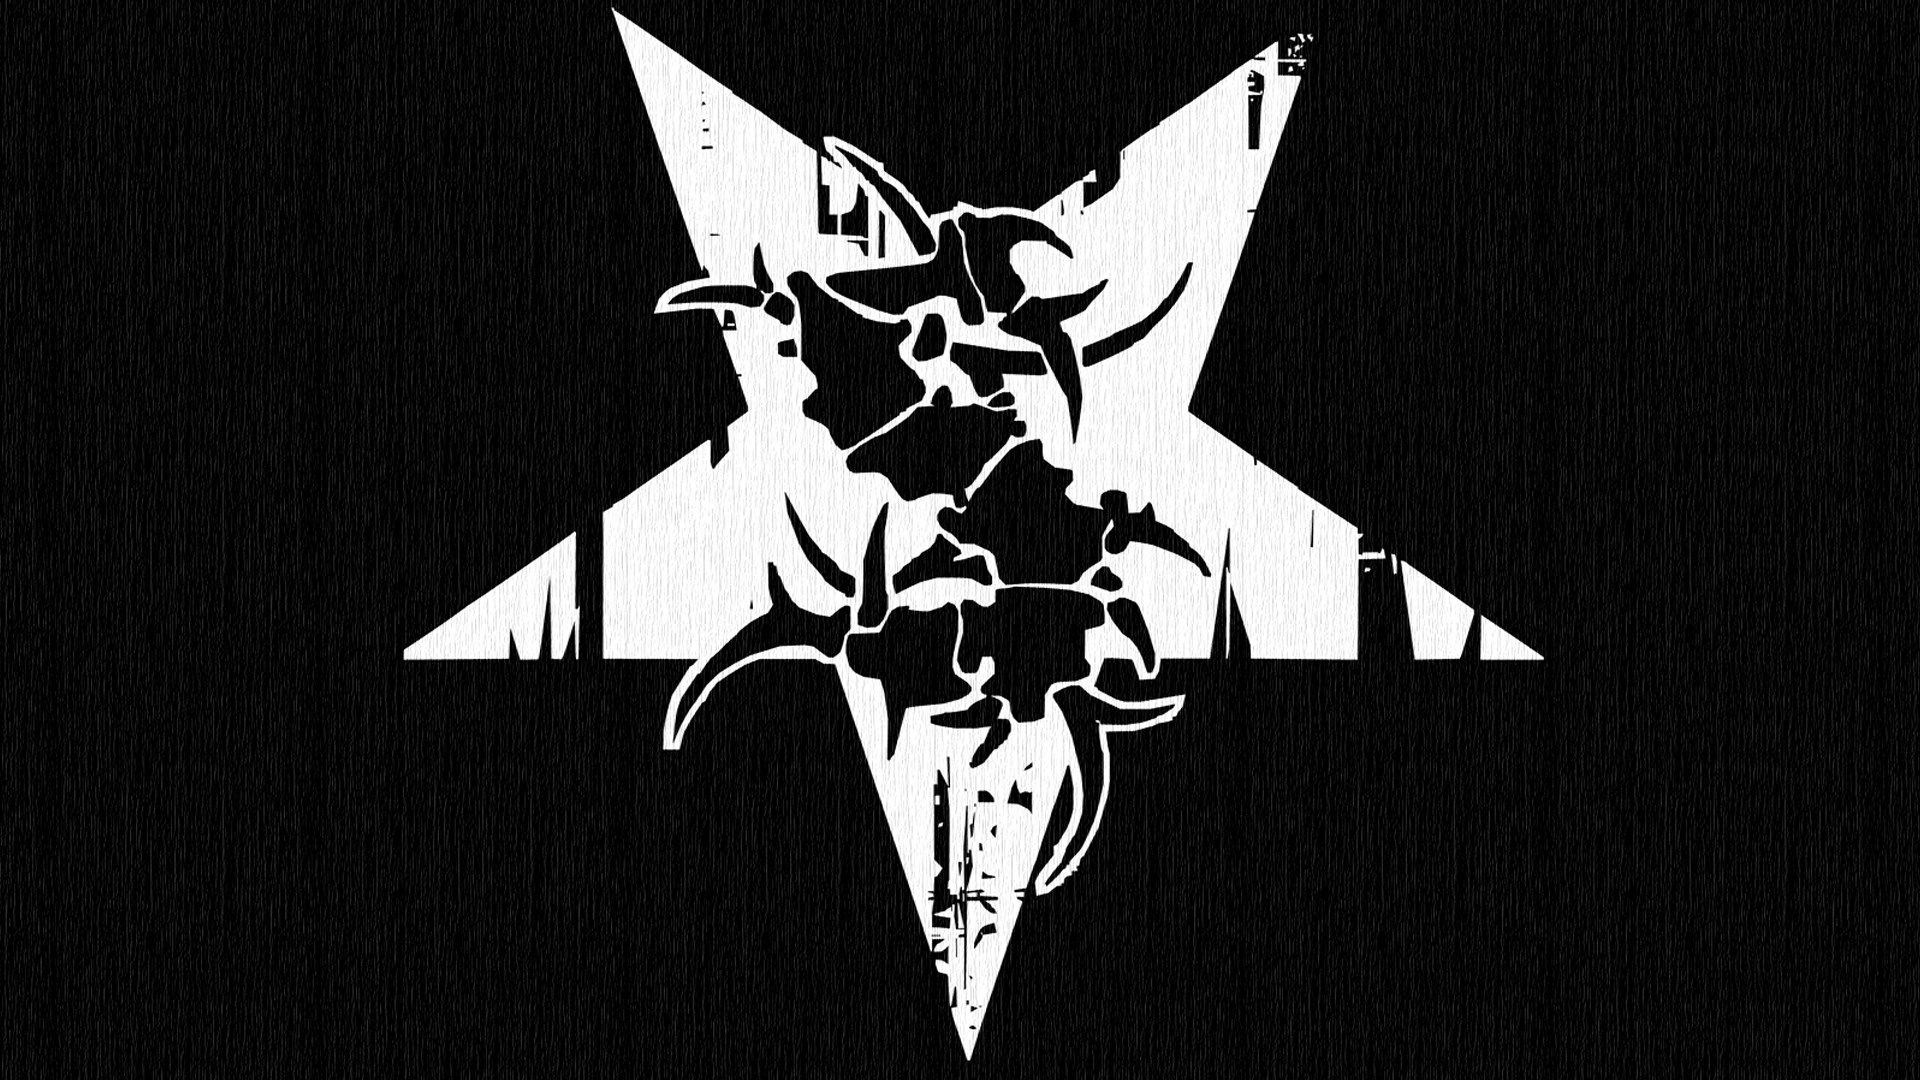 Sepultura Wallpaper For Desktop Background Sepultura Category Rock N Roll Art Rock Band Logos Poster Artwork